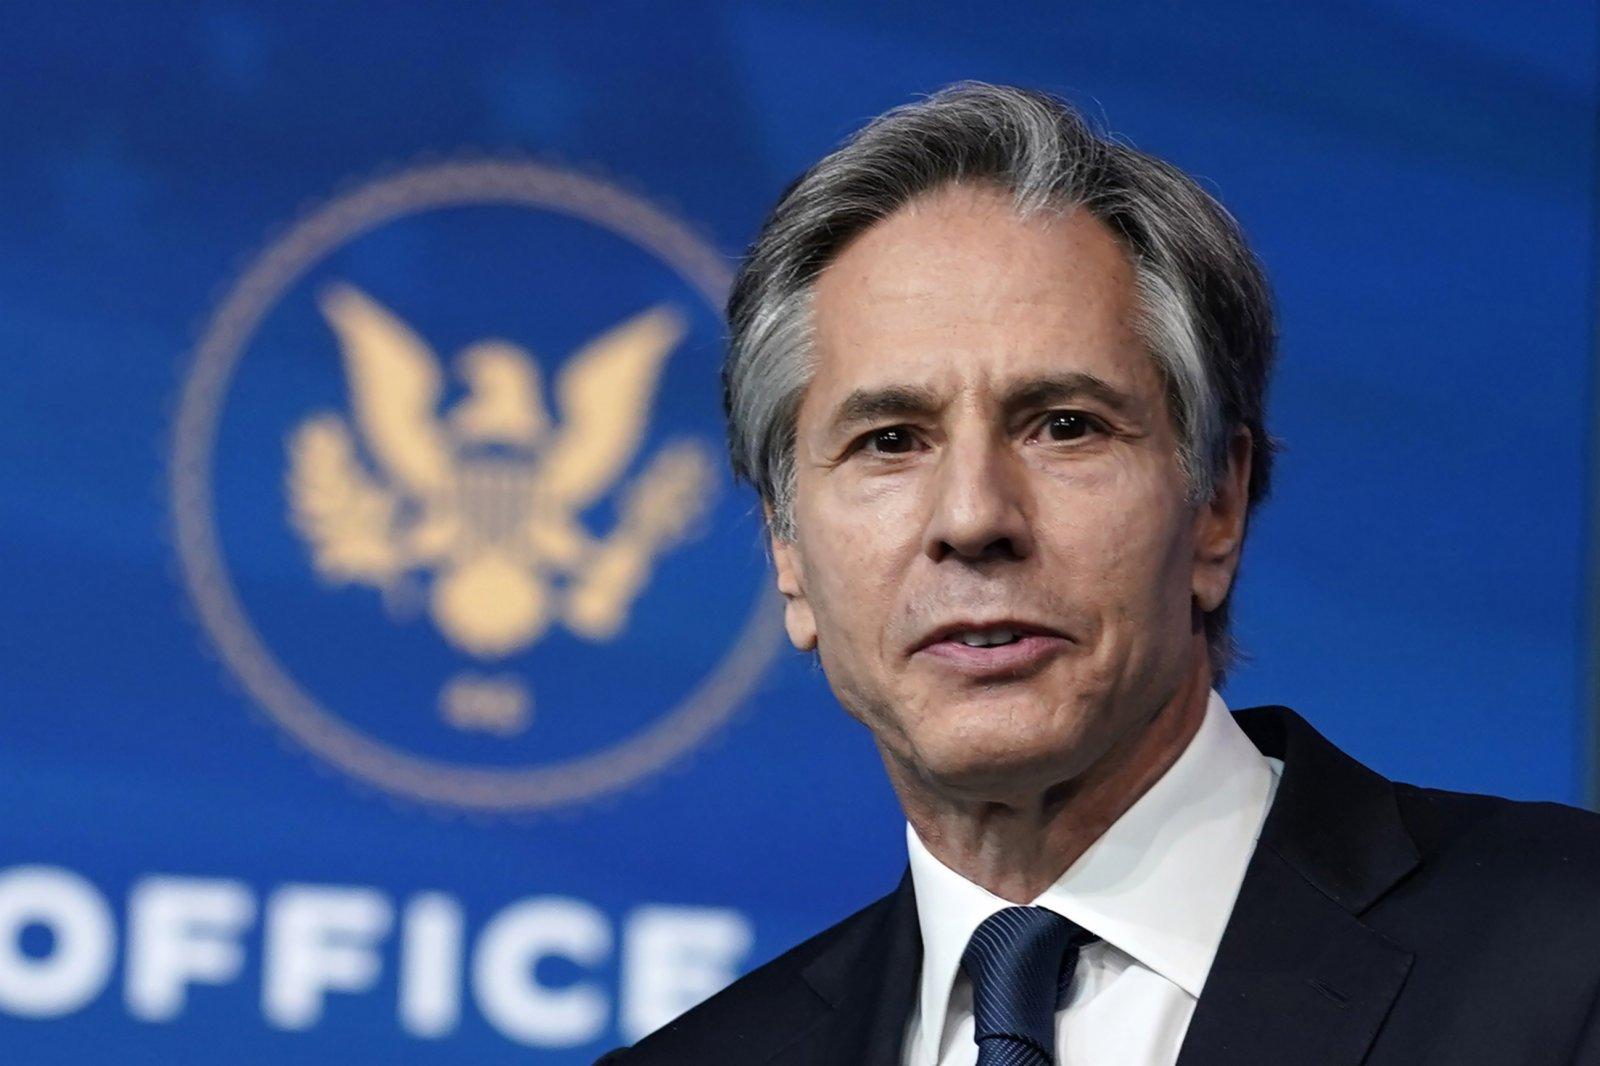 The U.S. Senate approved brinken as secretary of state